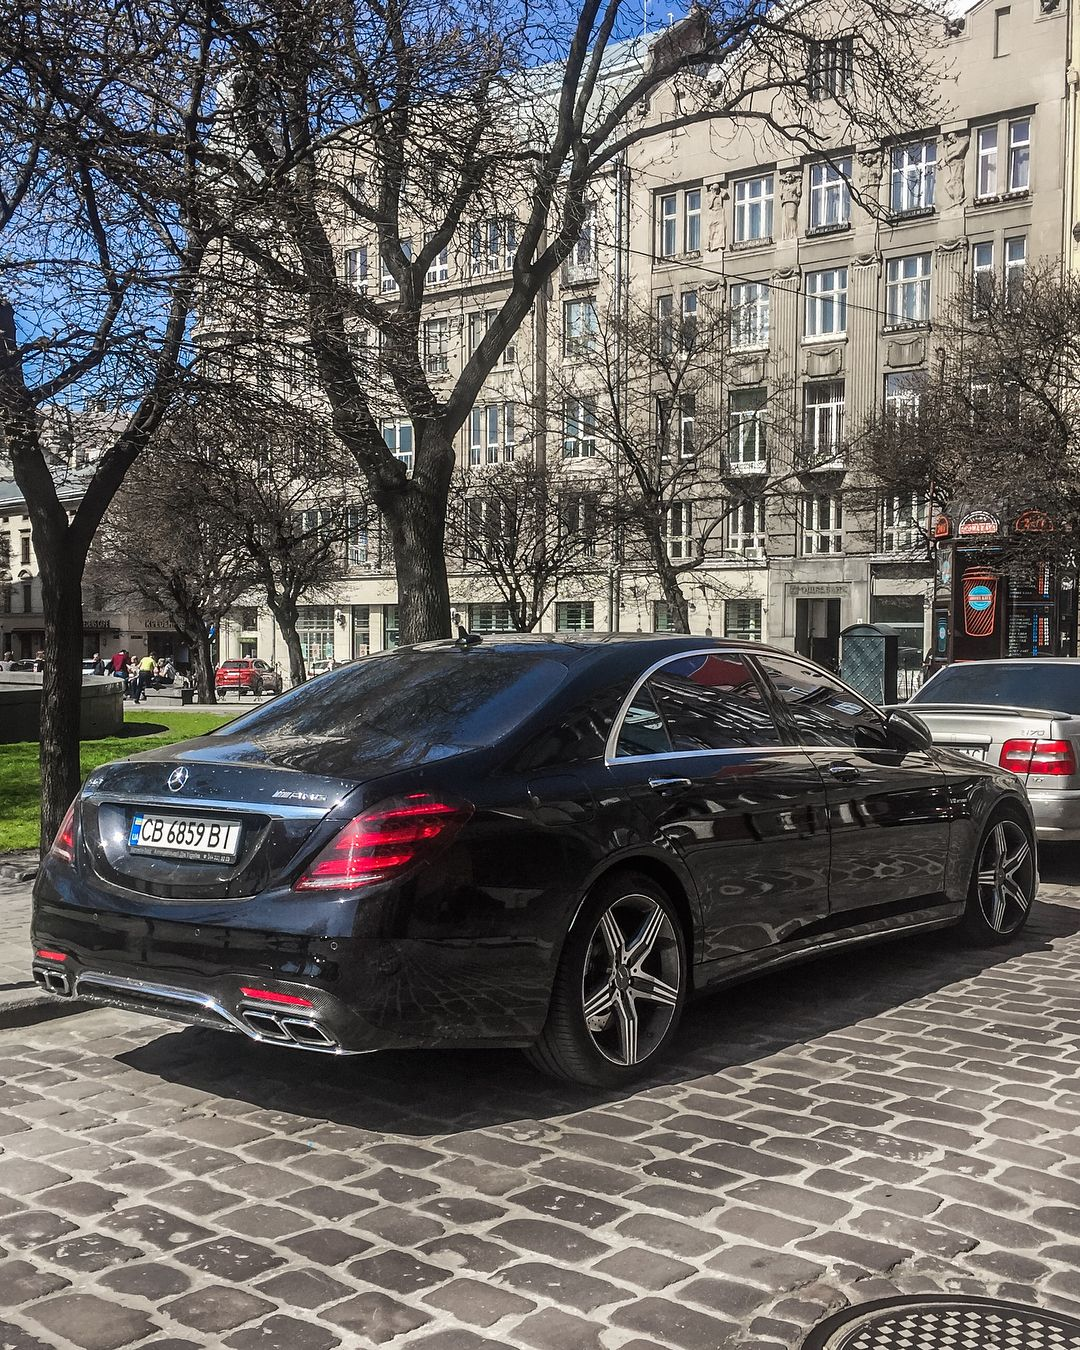 2018 Mercedes Amg S63 4matic Designo Diamand White Bright: 2018 Mercedes Benz S63 AMG (W222)